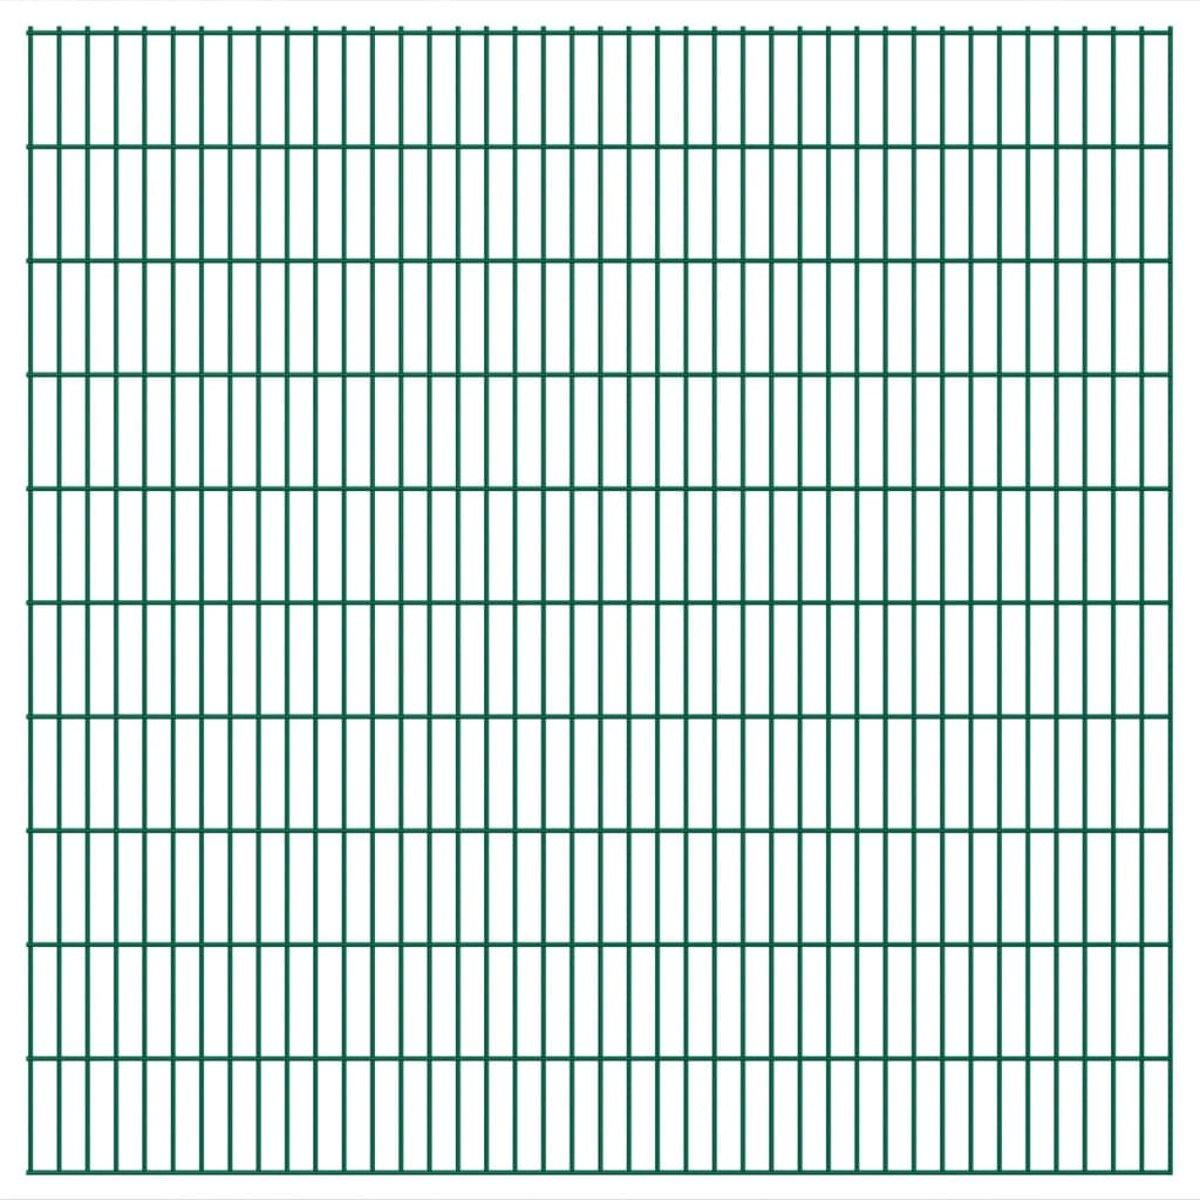 Dubbelstaafmatten 2008 x 2030mm 30m Groen 15 stuks (incl. Werkhandschoenen)